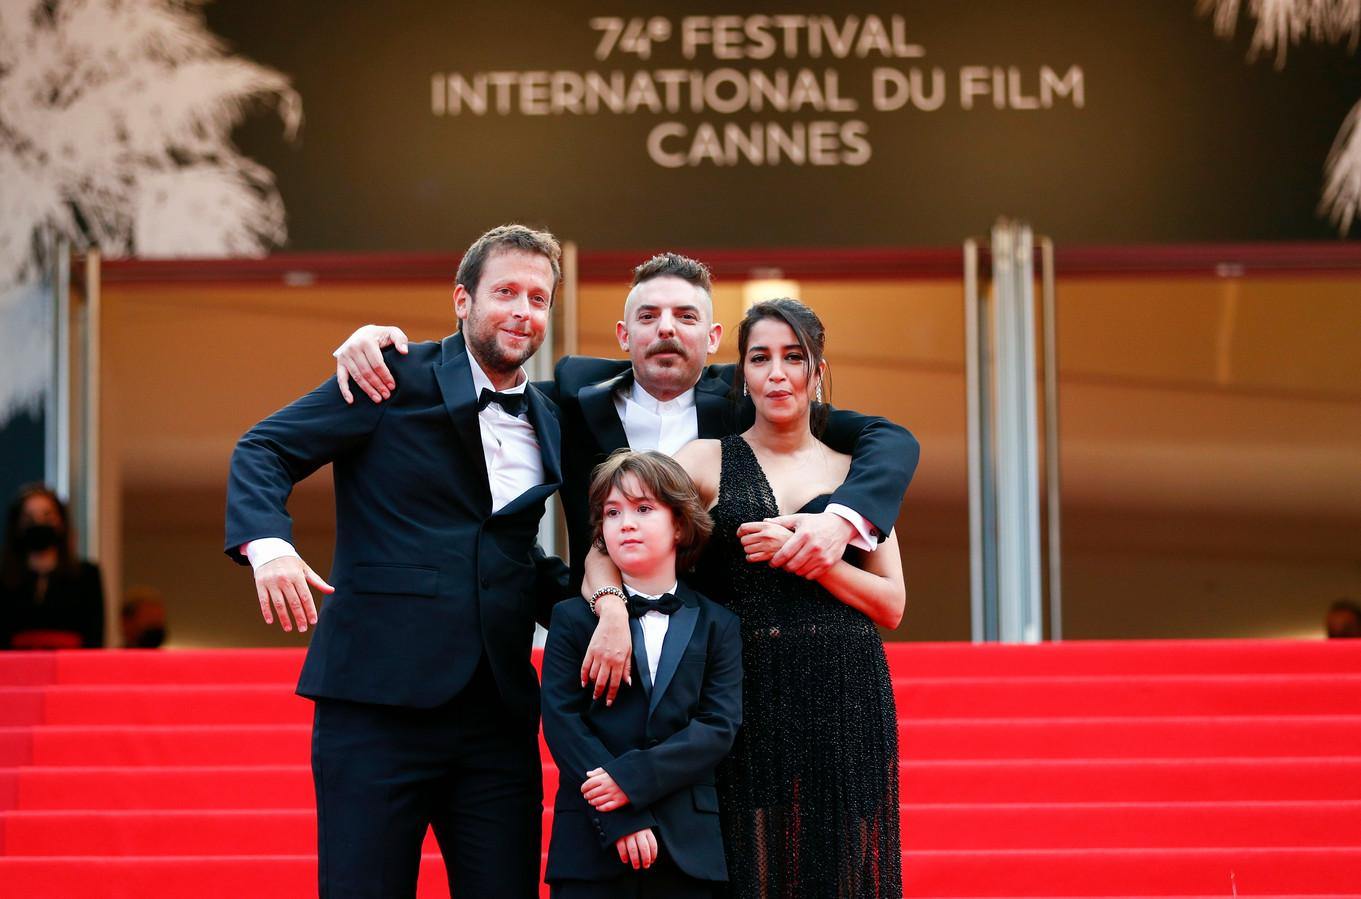 Joachim Lafosse, Leila Bekhti, Damien Bonnard et Gabriel Merz Chammah